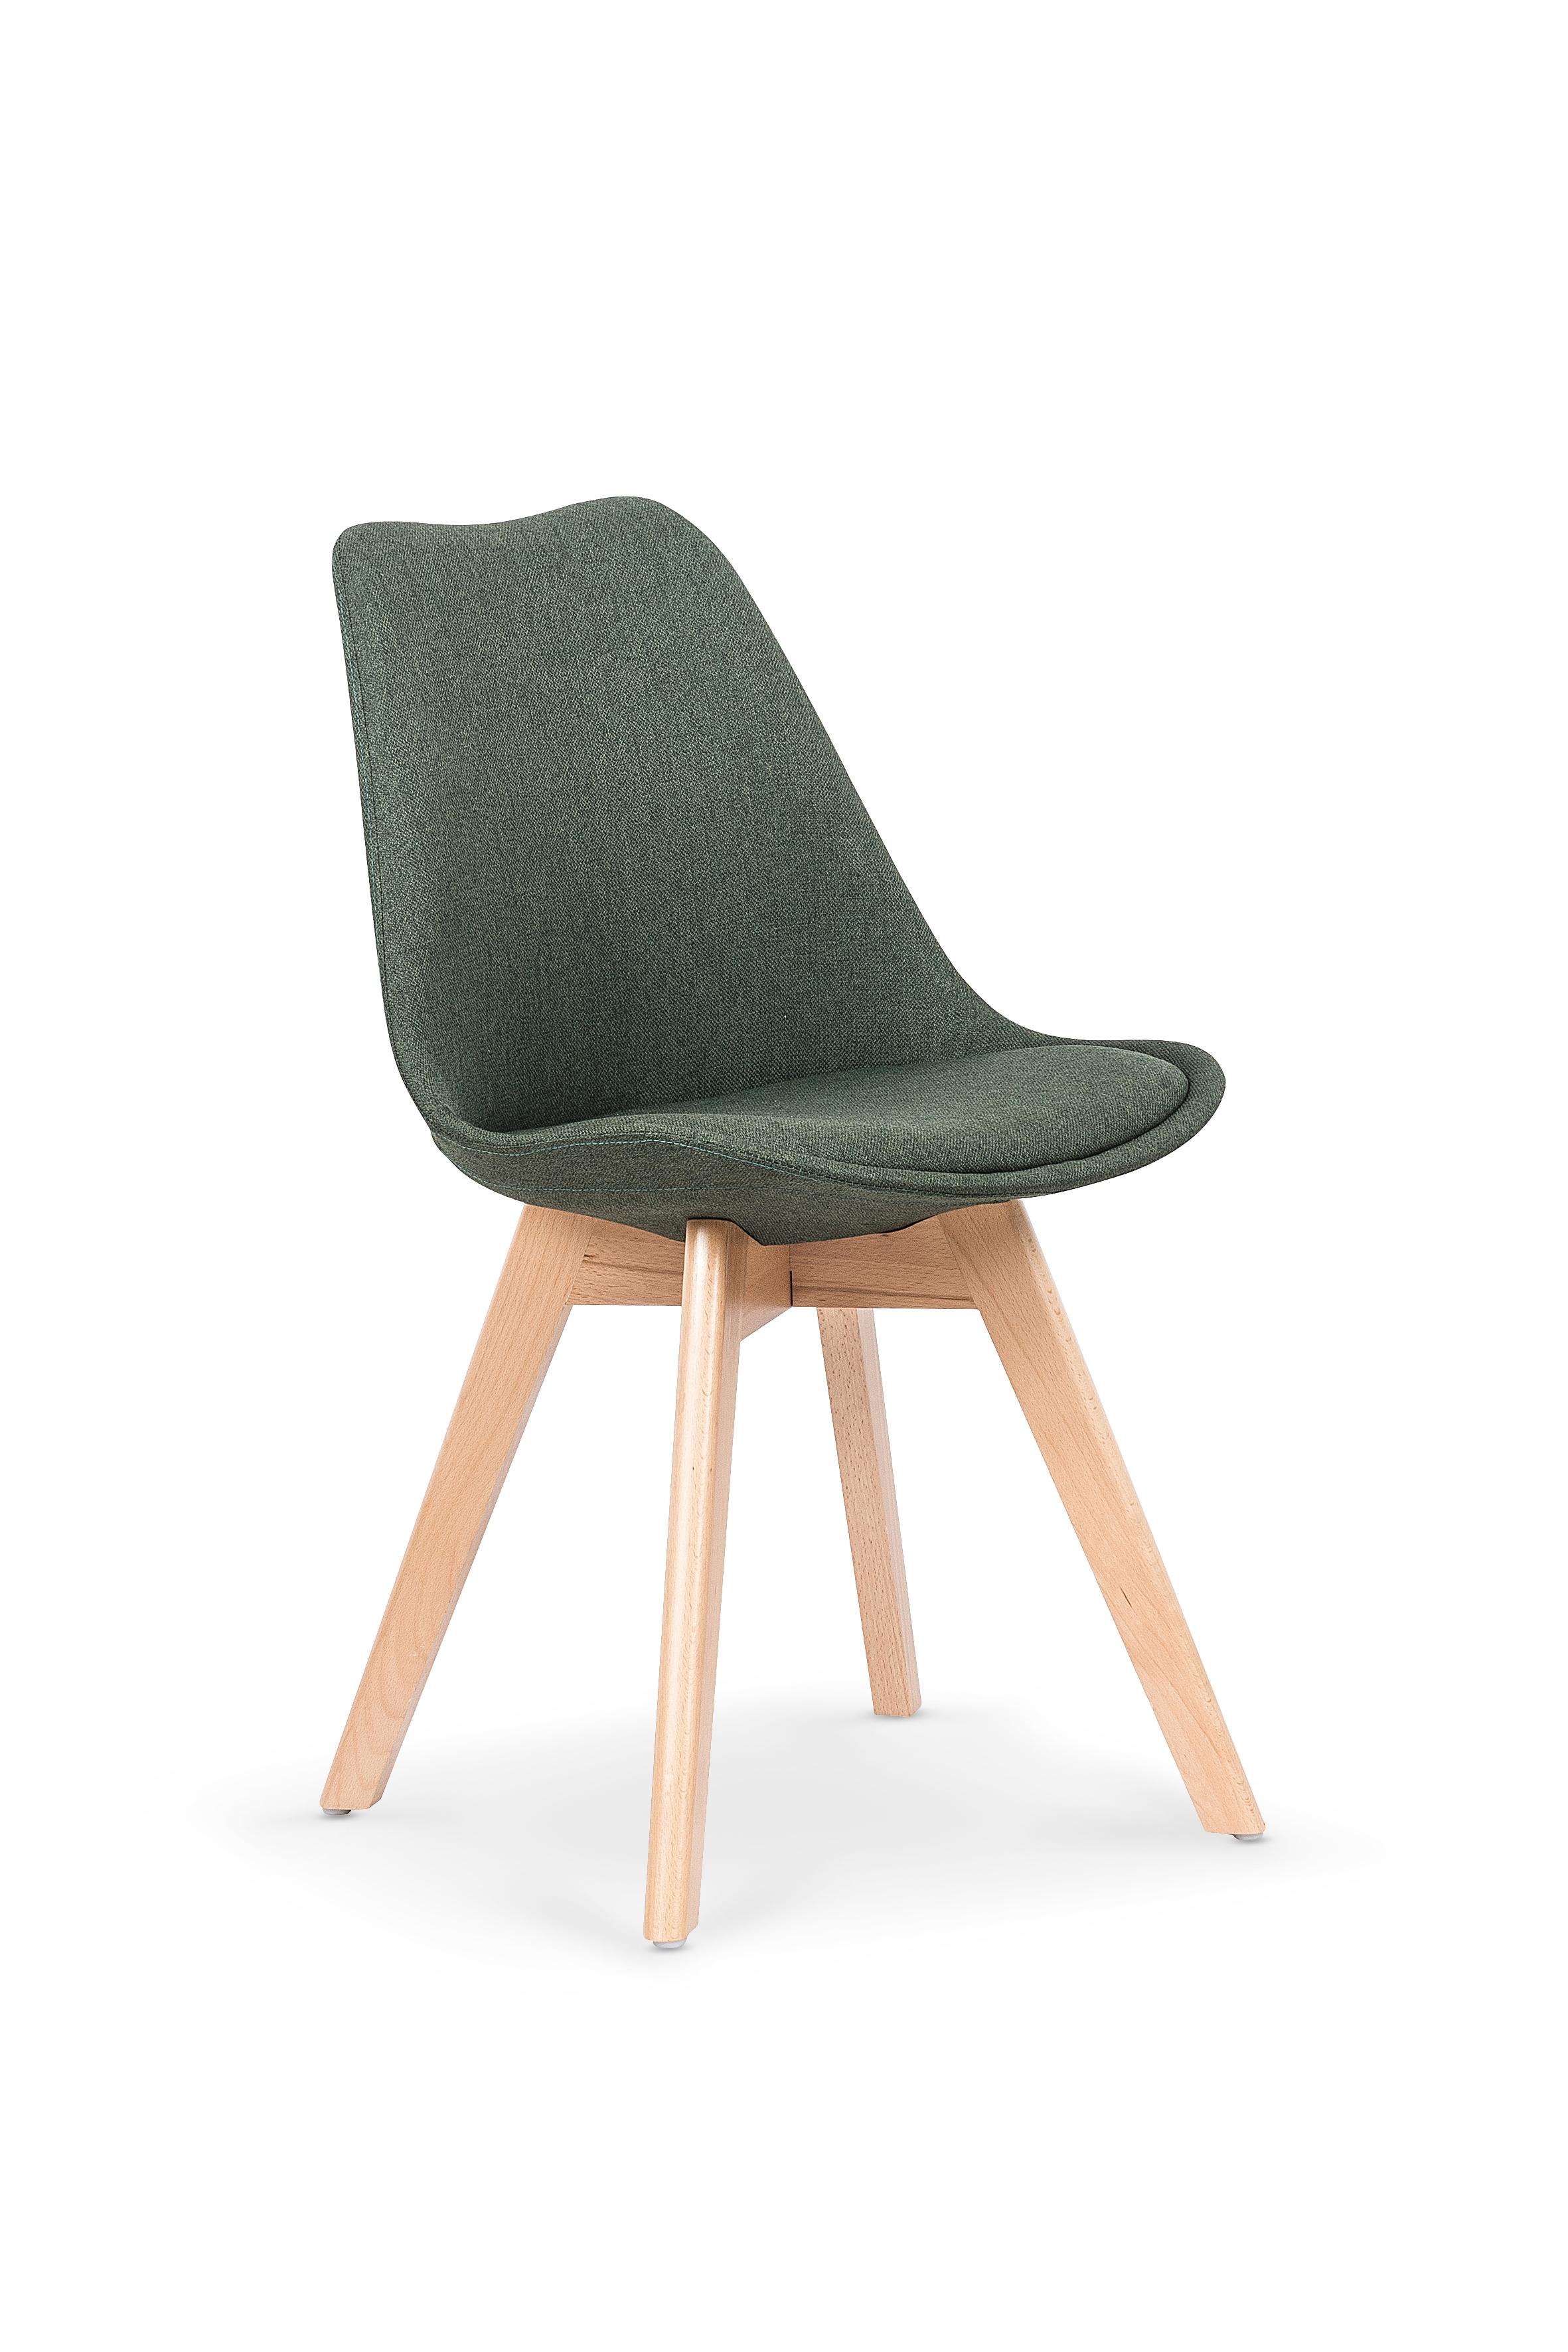 Scaun tapitat cu stofa, cu picioare din lemn K303 Dark Green, l48xA54xH83 cm